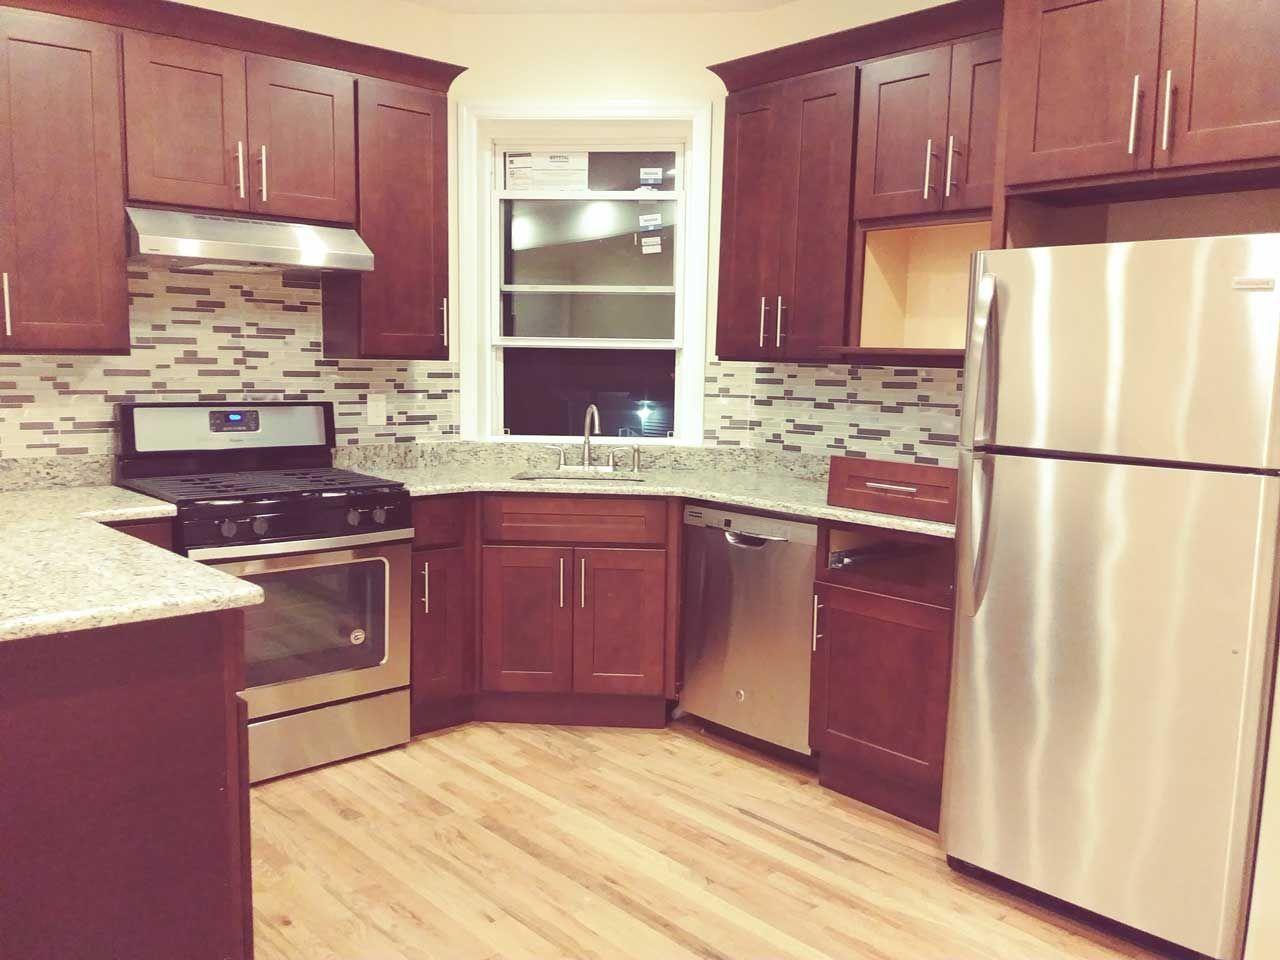 Gallery lofts 509 511 south orange avenue newark 1 loft